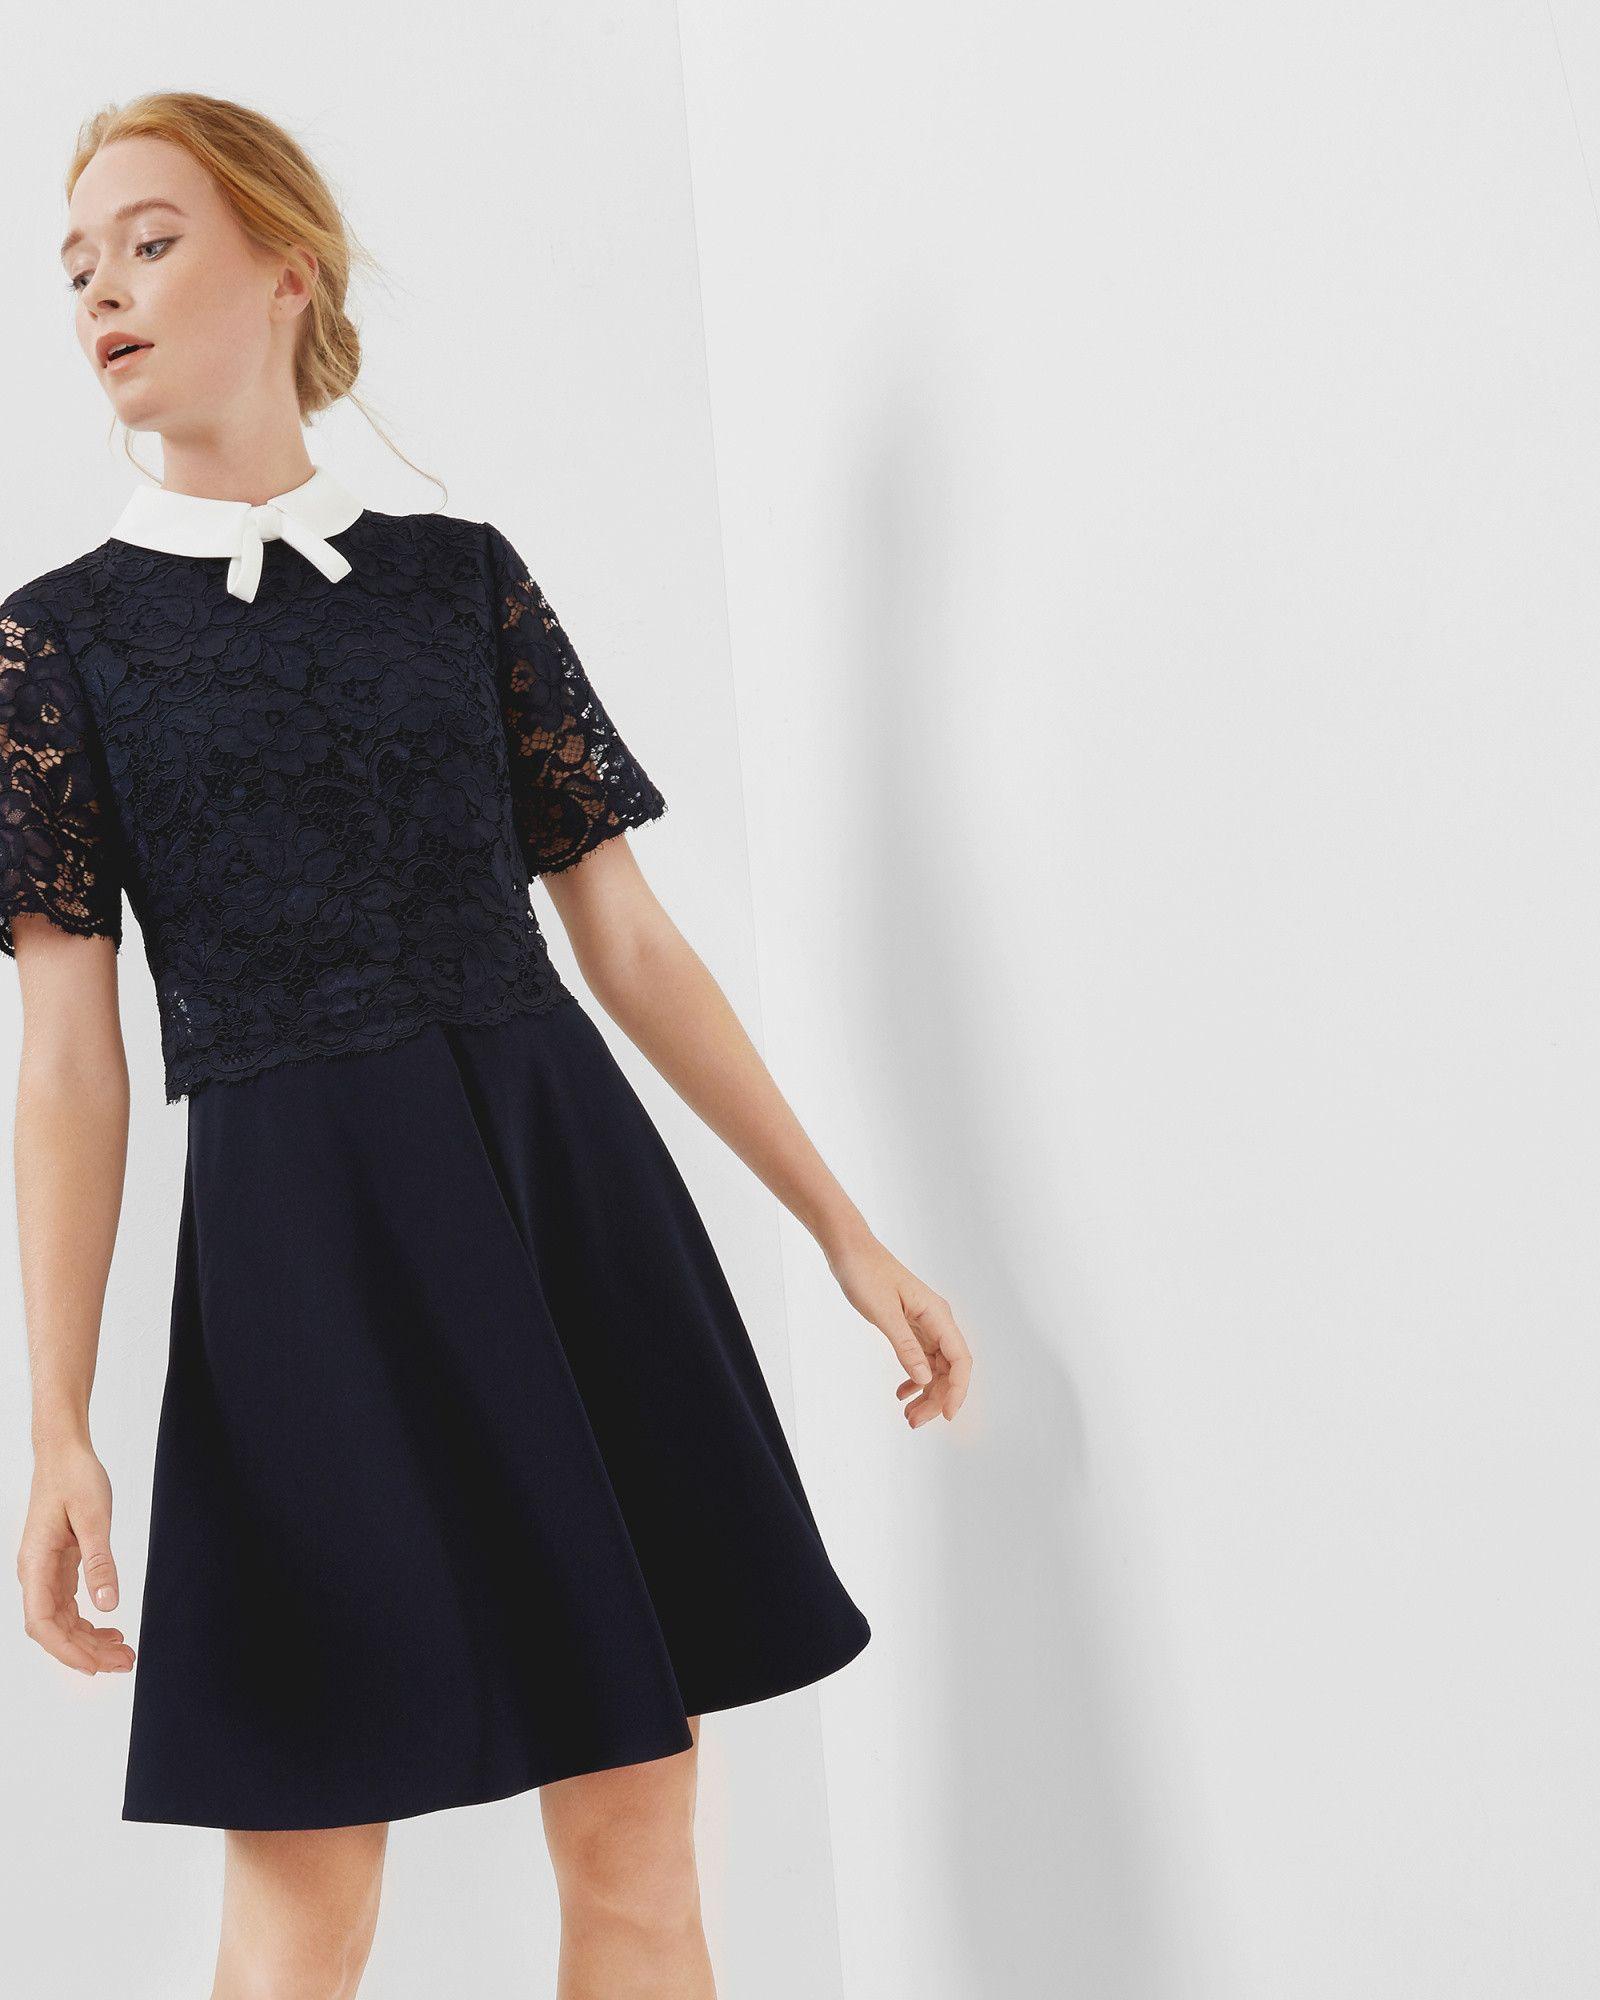 Lace dress navy  Layered lace dress  Navy  Dresses  Ted Baker UK  fashion